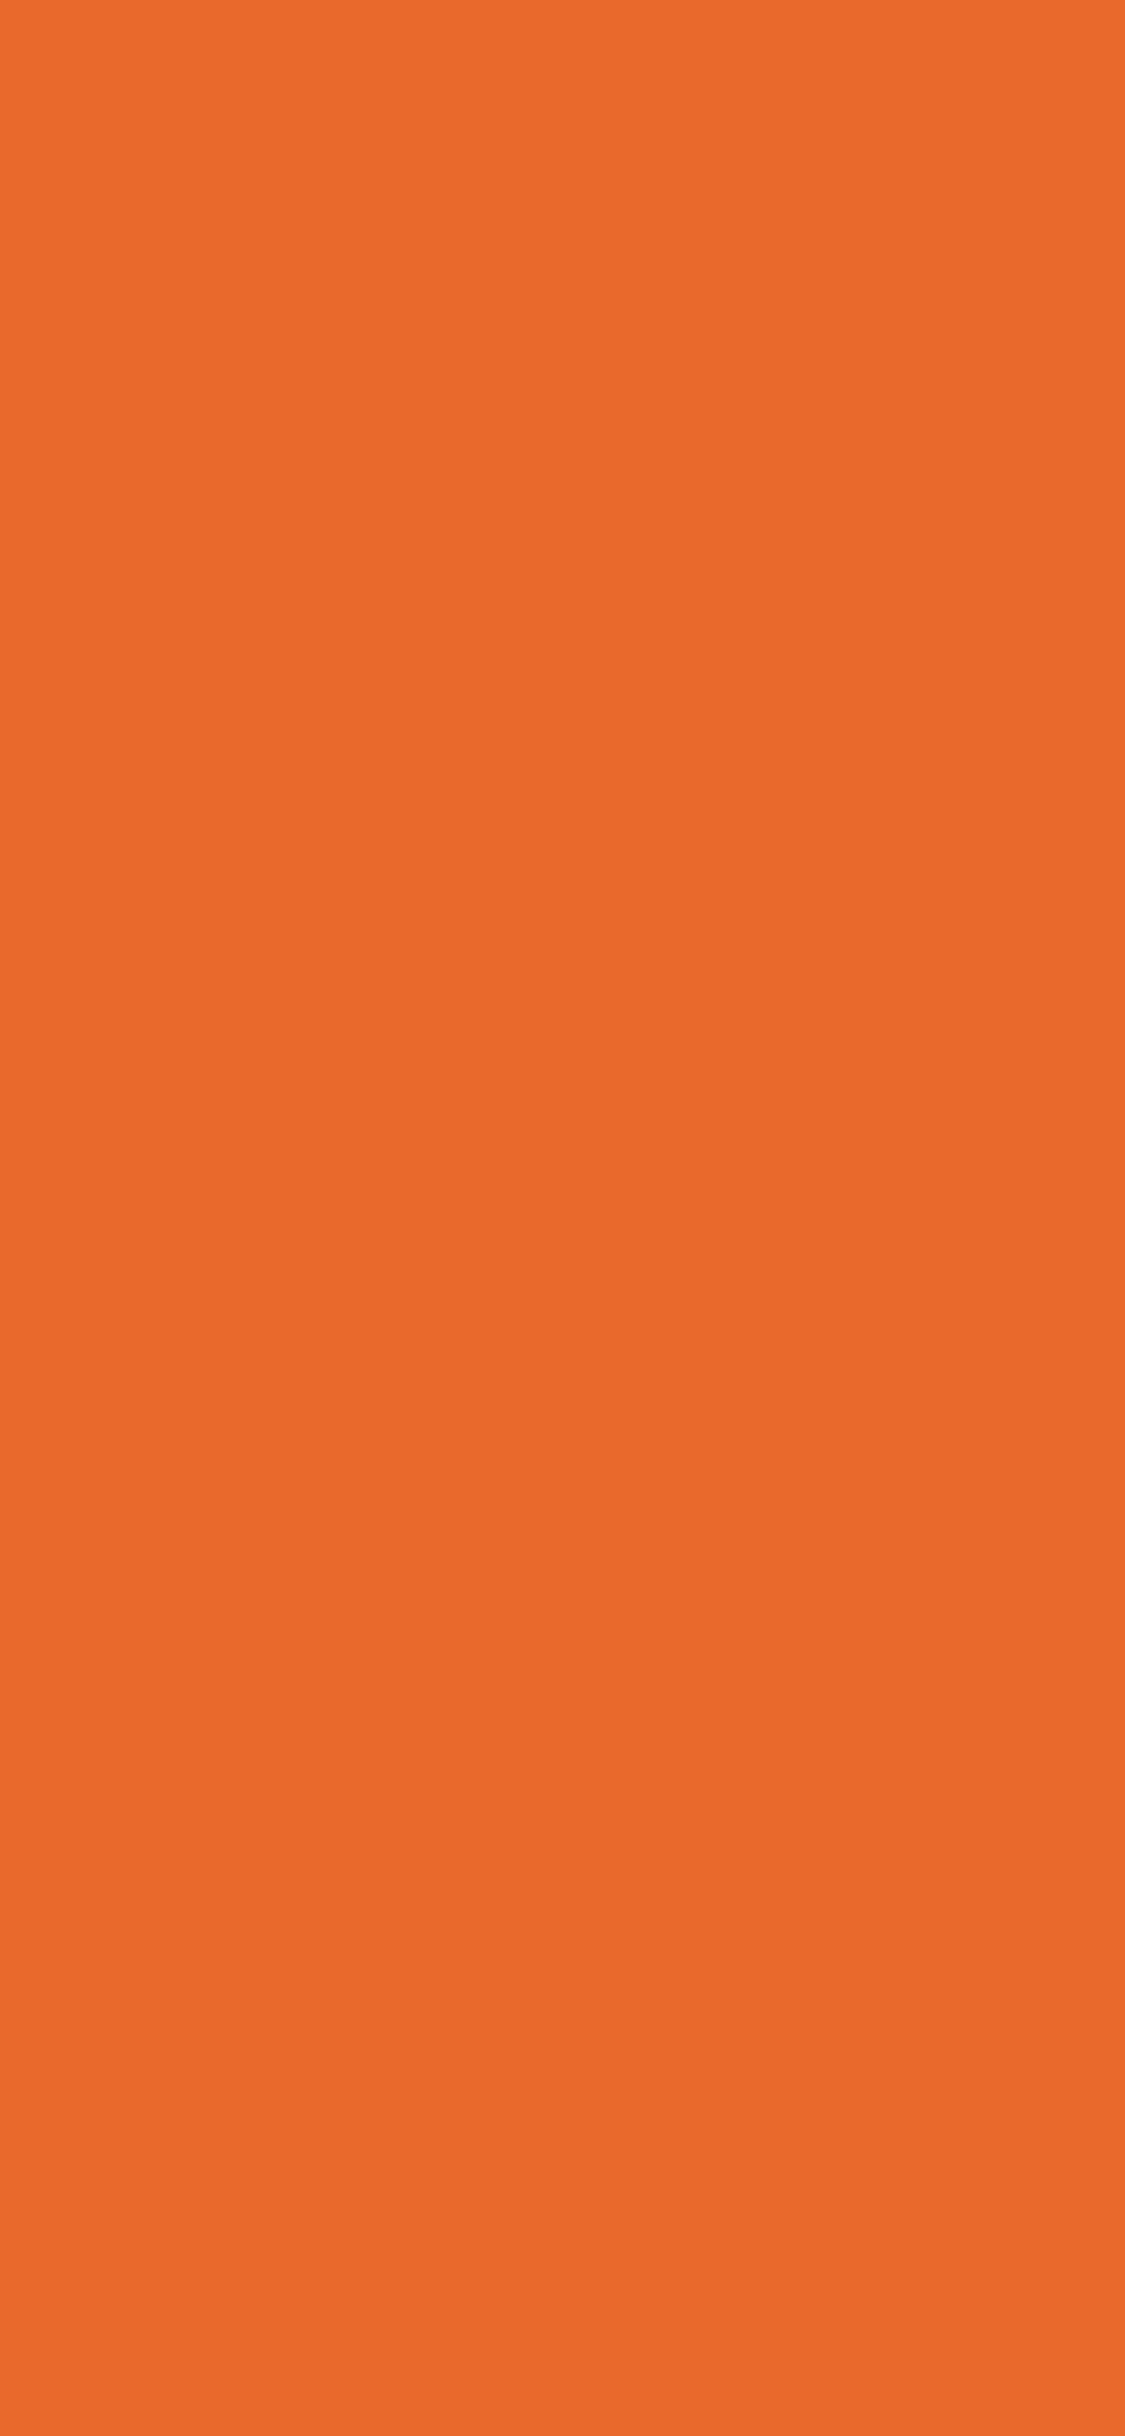 1125x2436 Deep Carrot Orange Solid Color Background